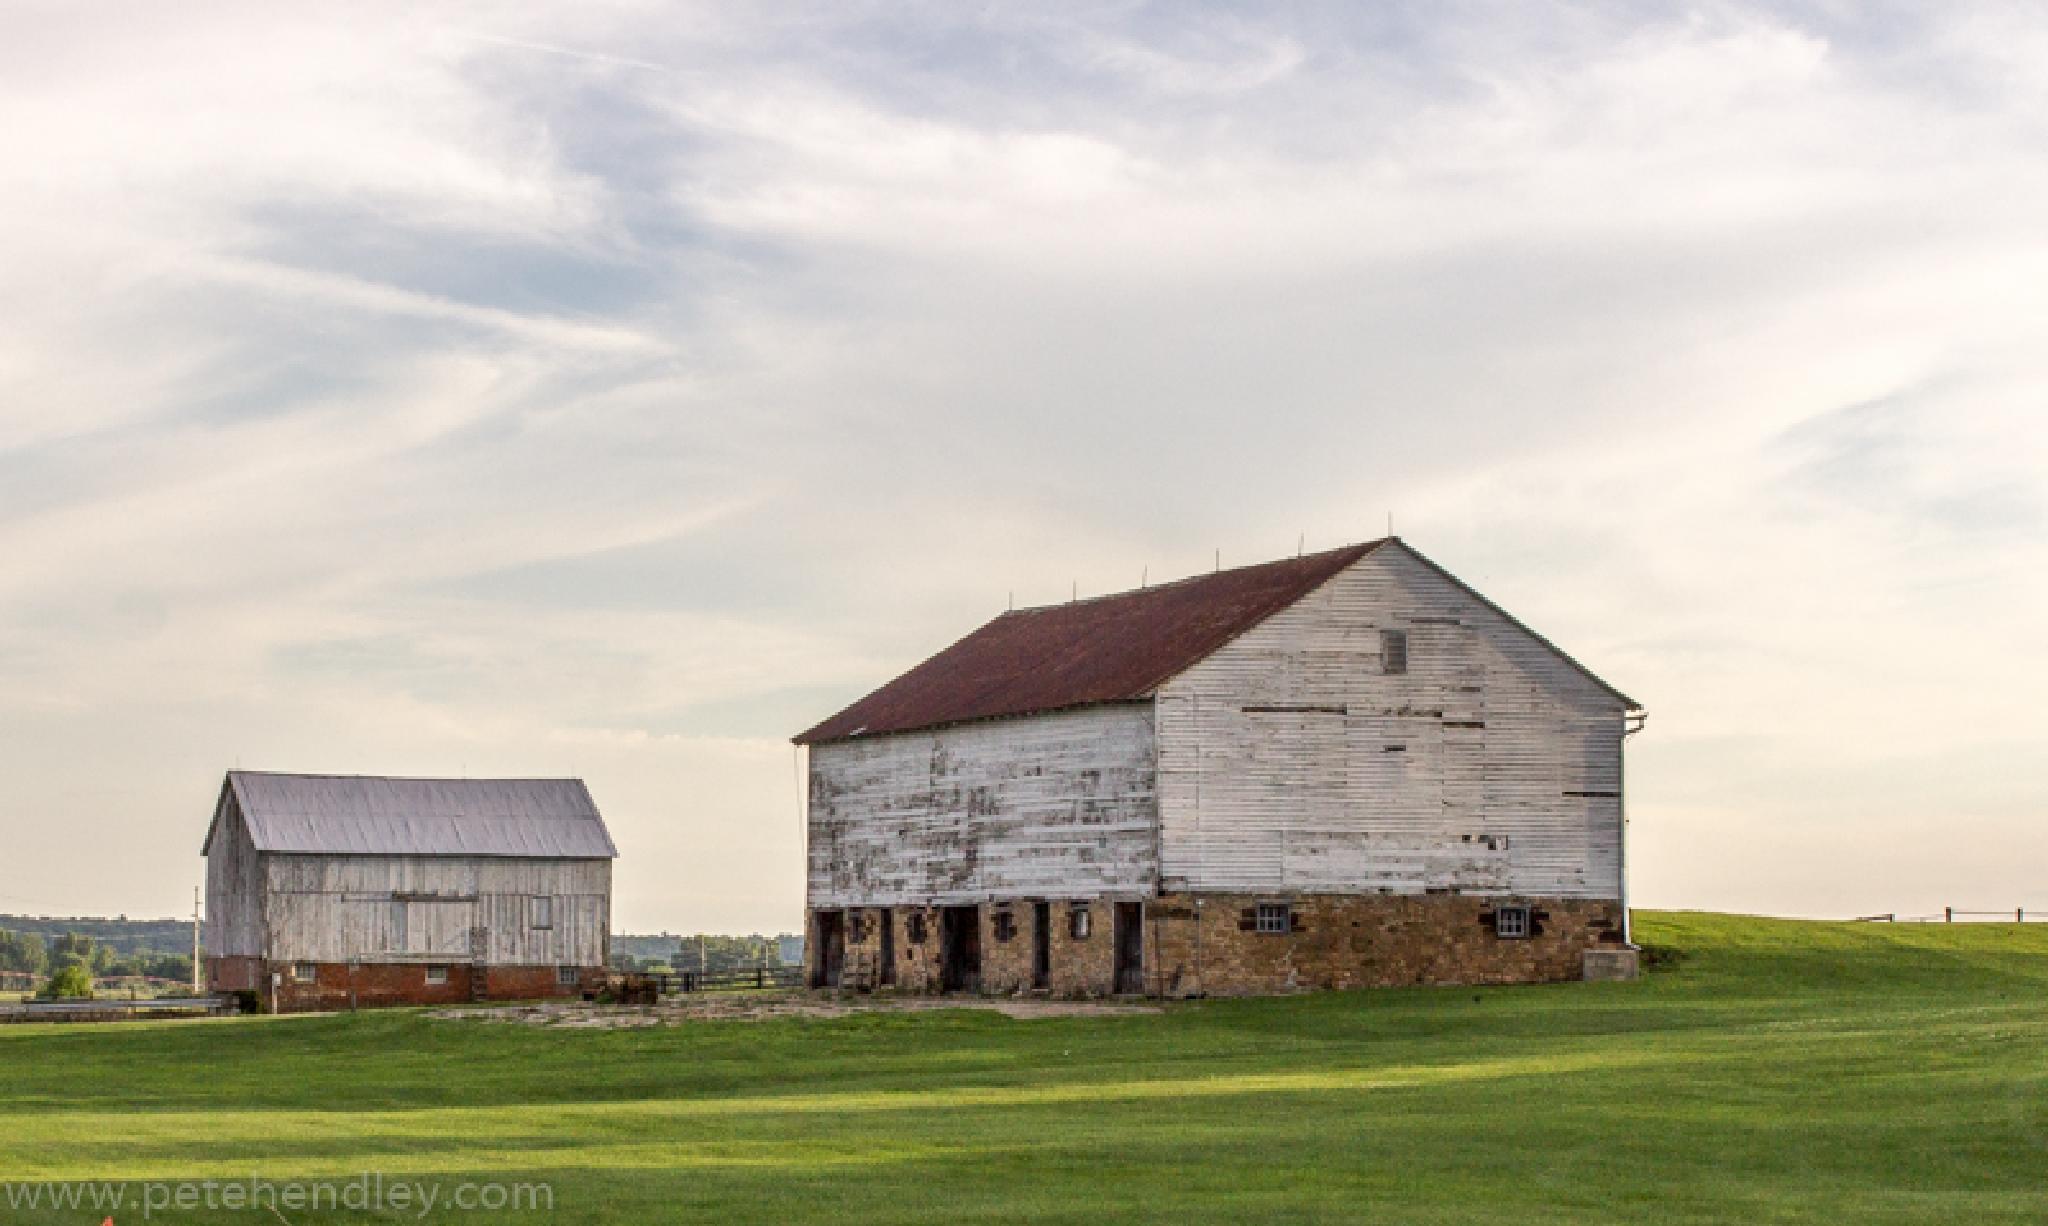 Iowa Barns by Pete Hendley Photography